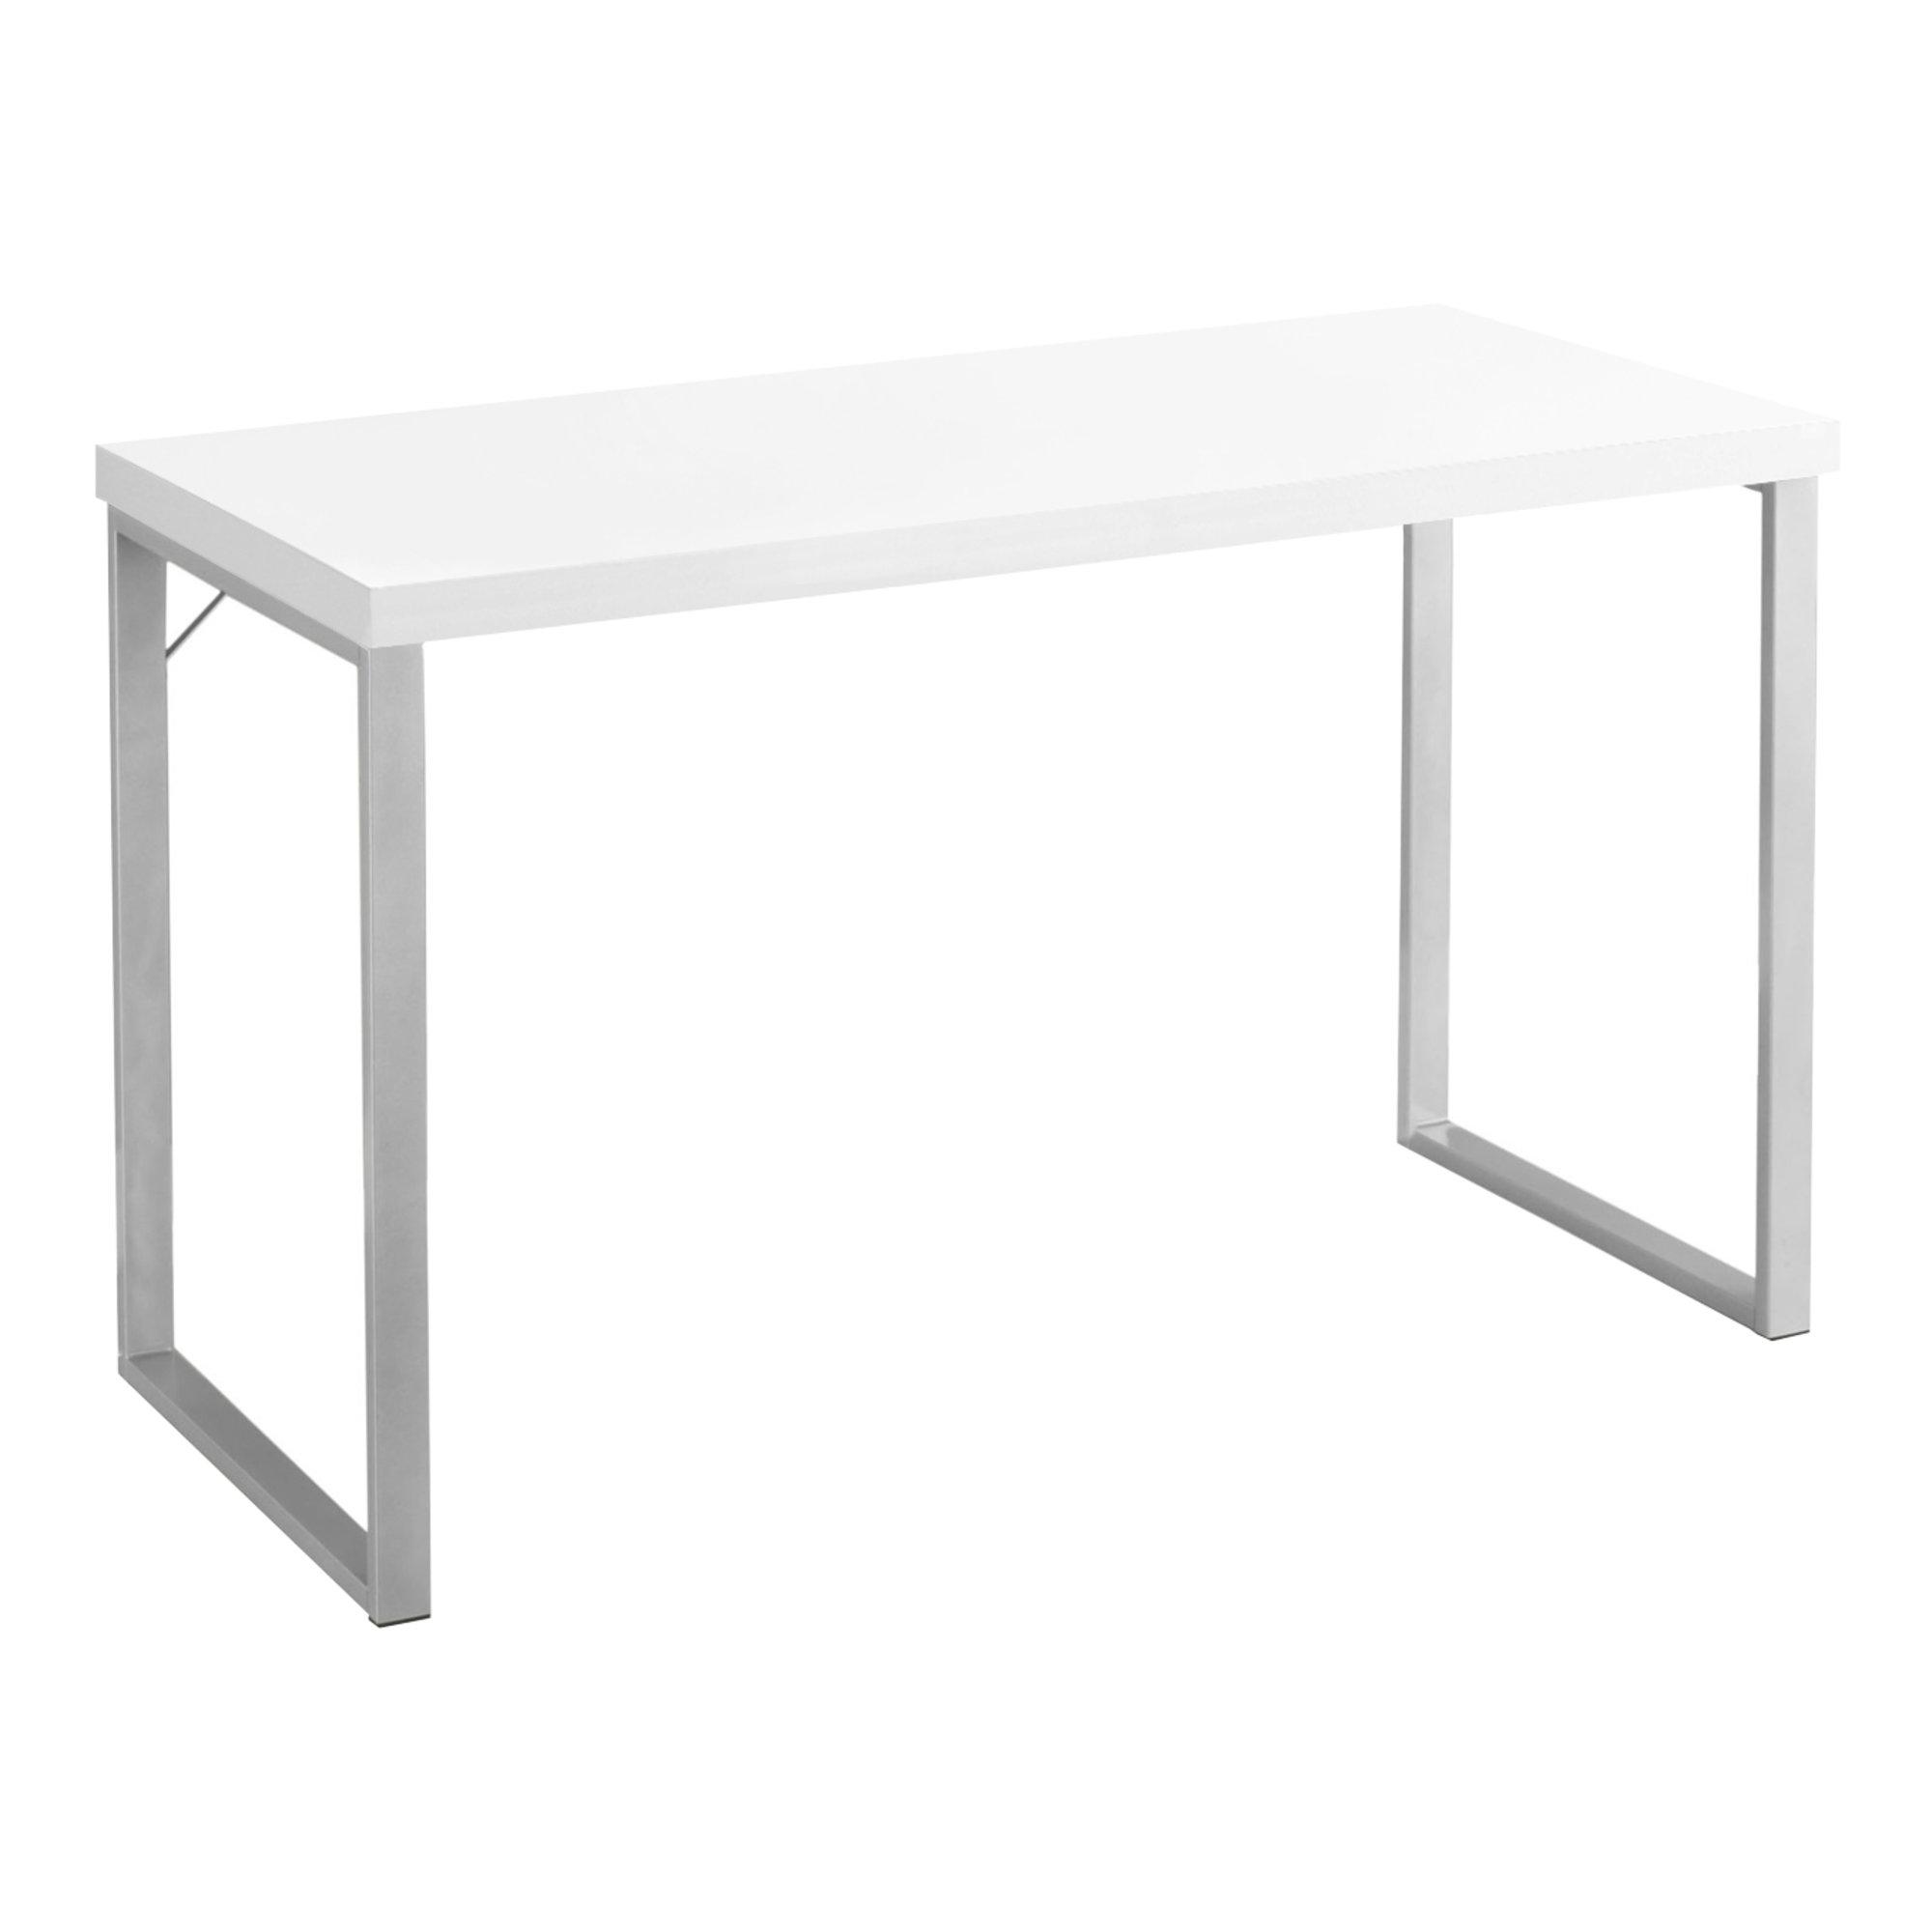 "23.75"" x 47.25"" x 30"" White Silver Particle Board Hollow Core Metal  Computer Desk"